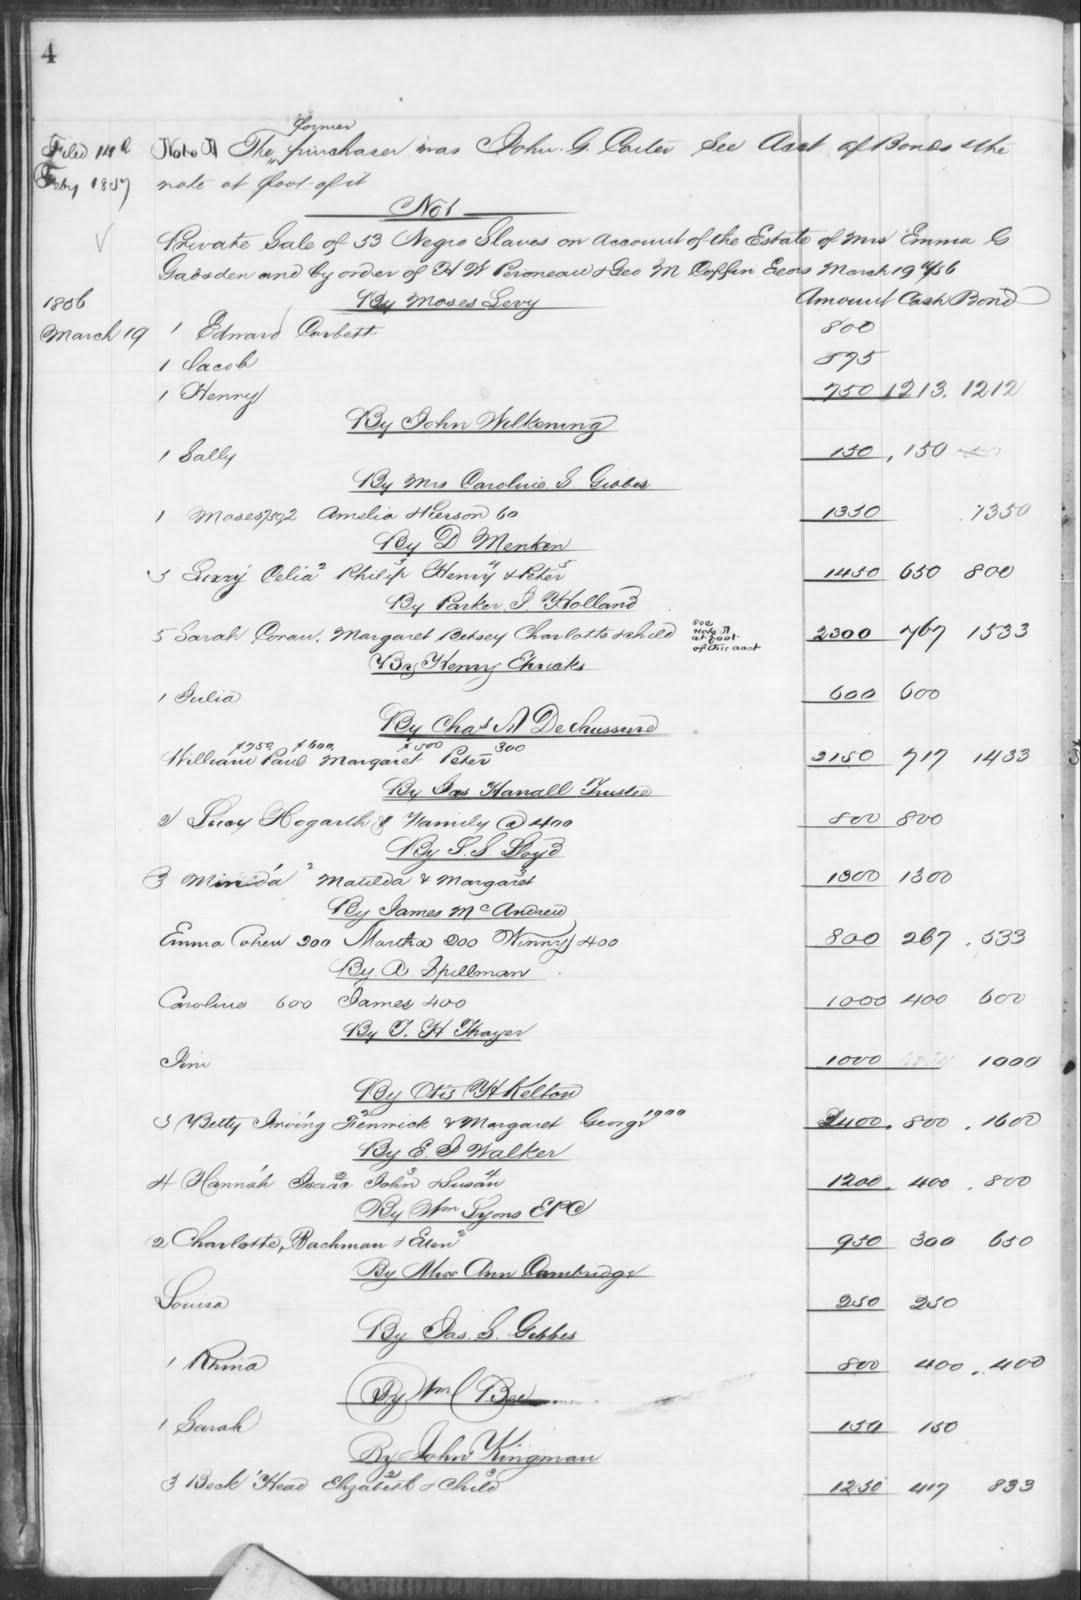 DearMYRTLE's Genealogy Blog: Low County Africana ...